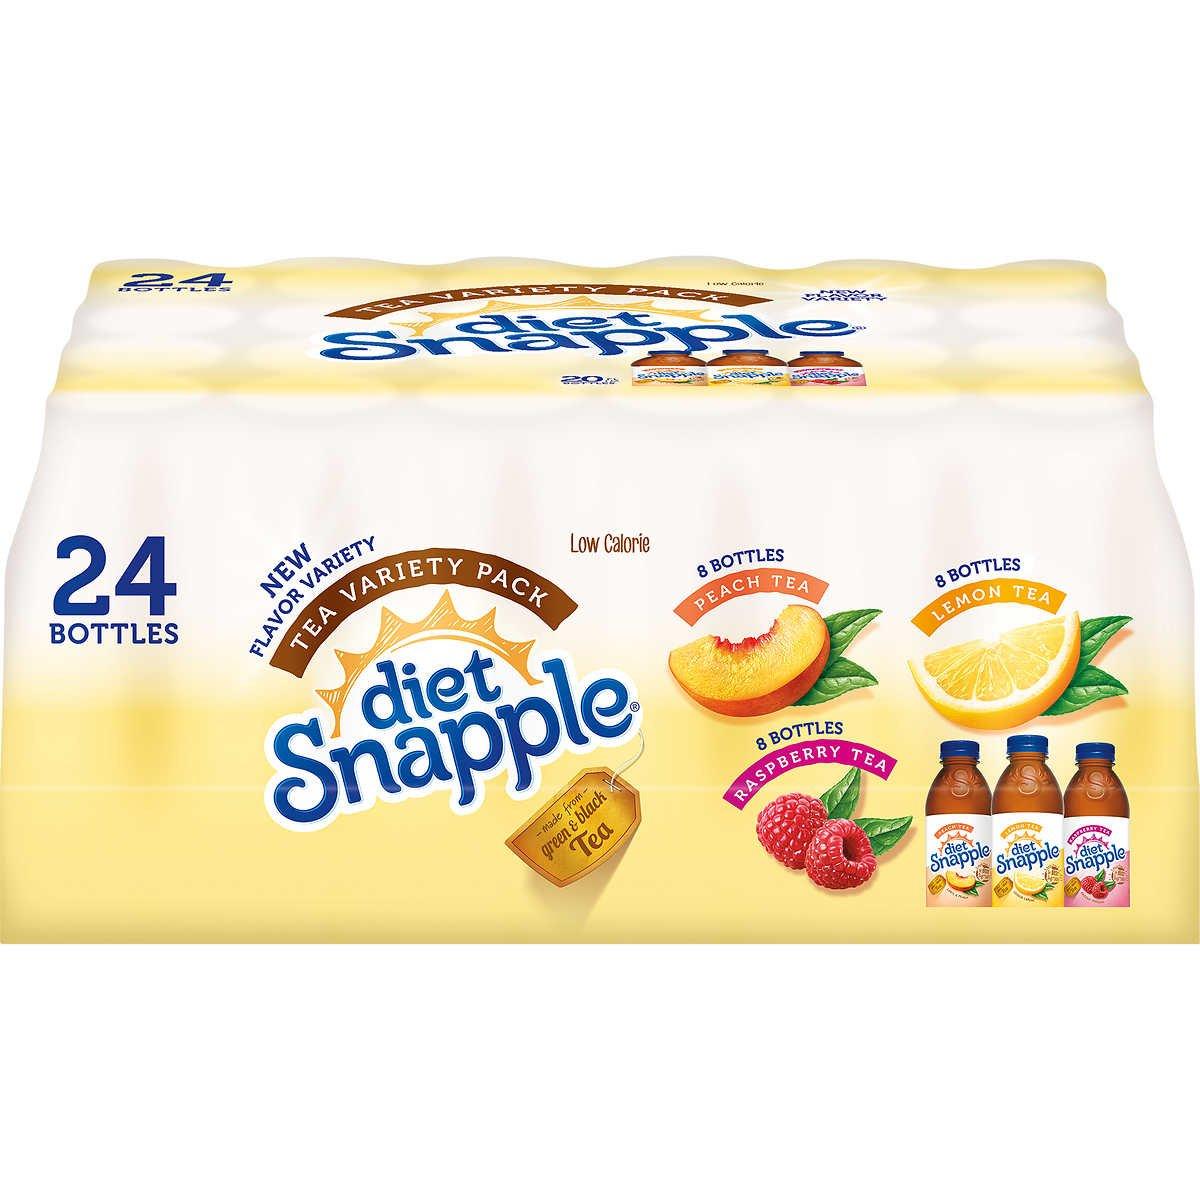 Snapple Diet Iced Tea, Variety Pack, 20 oz, 24 ct